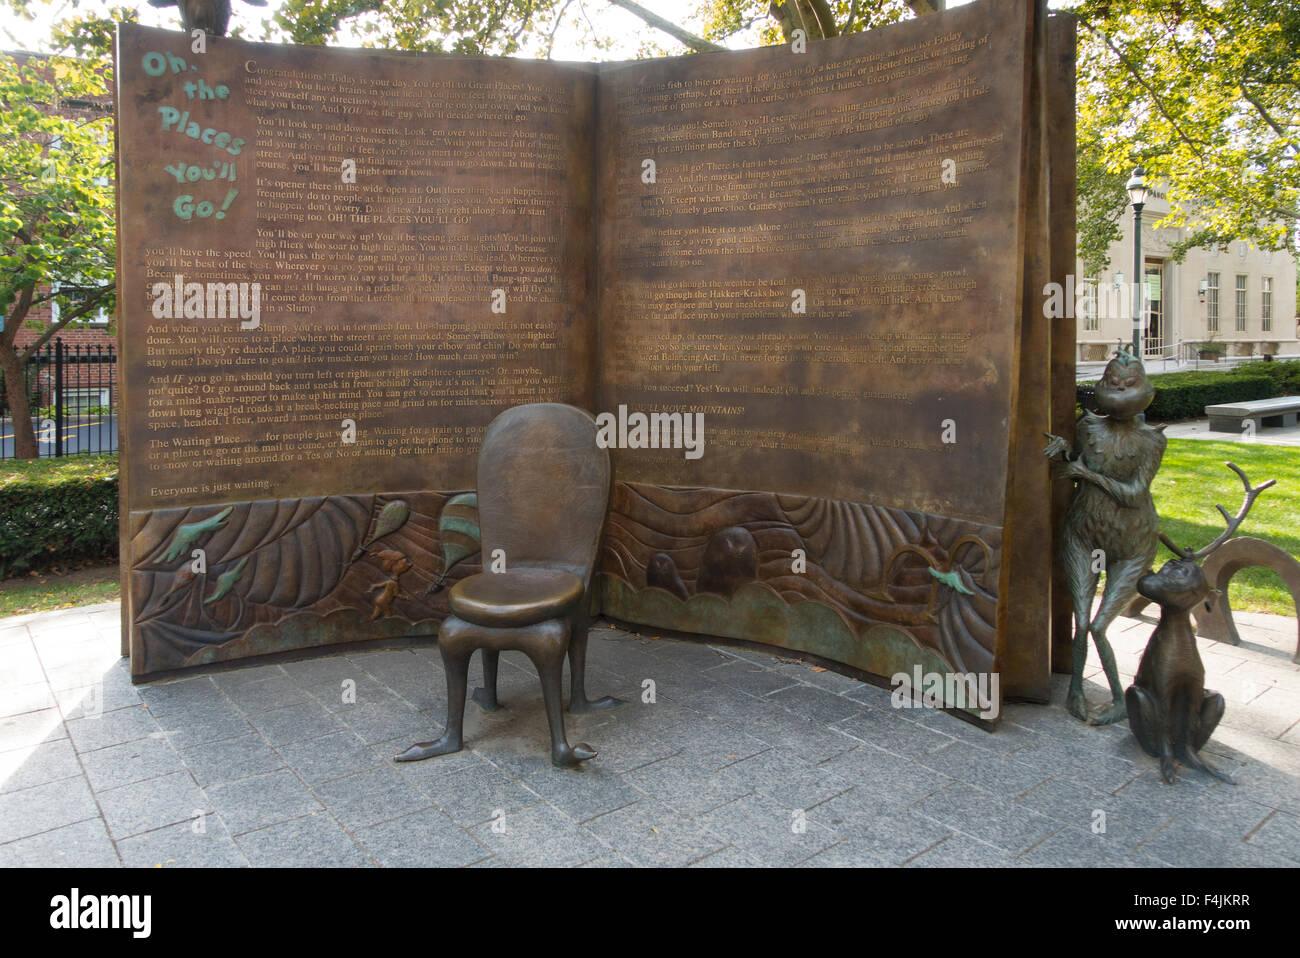 Dr Seuss National Memorial Sculpture Garden Stock Photo Royalty Free Image 88921163 Alamy